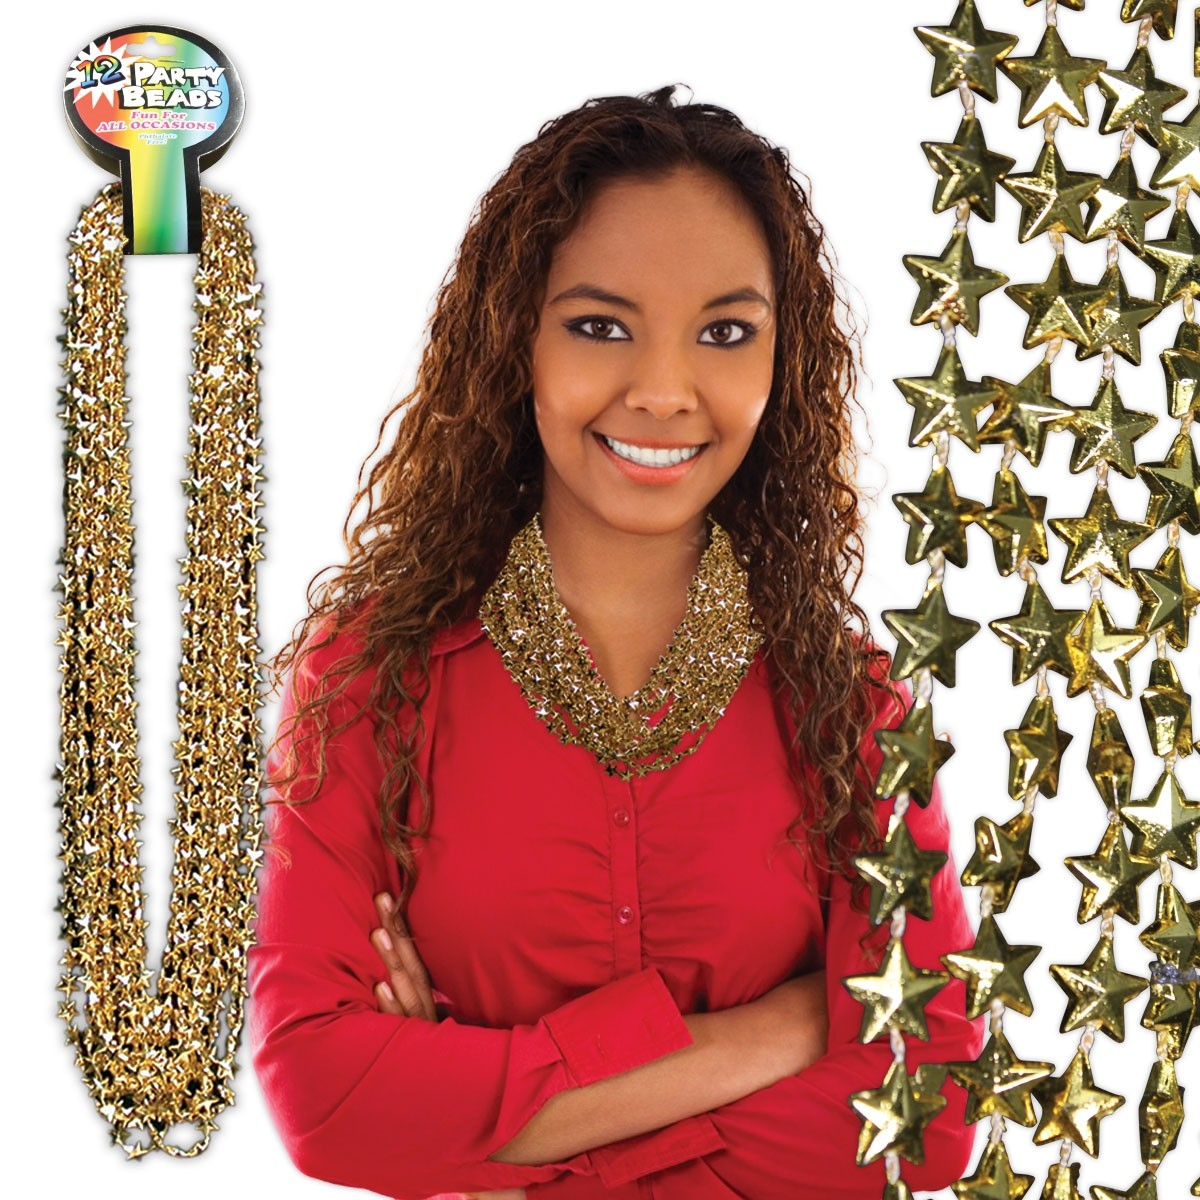 Gold Star Beads